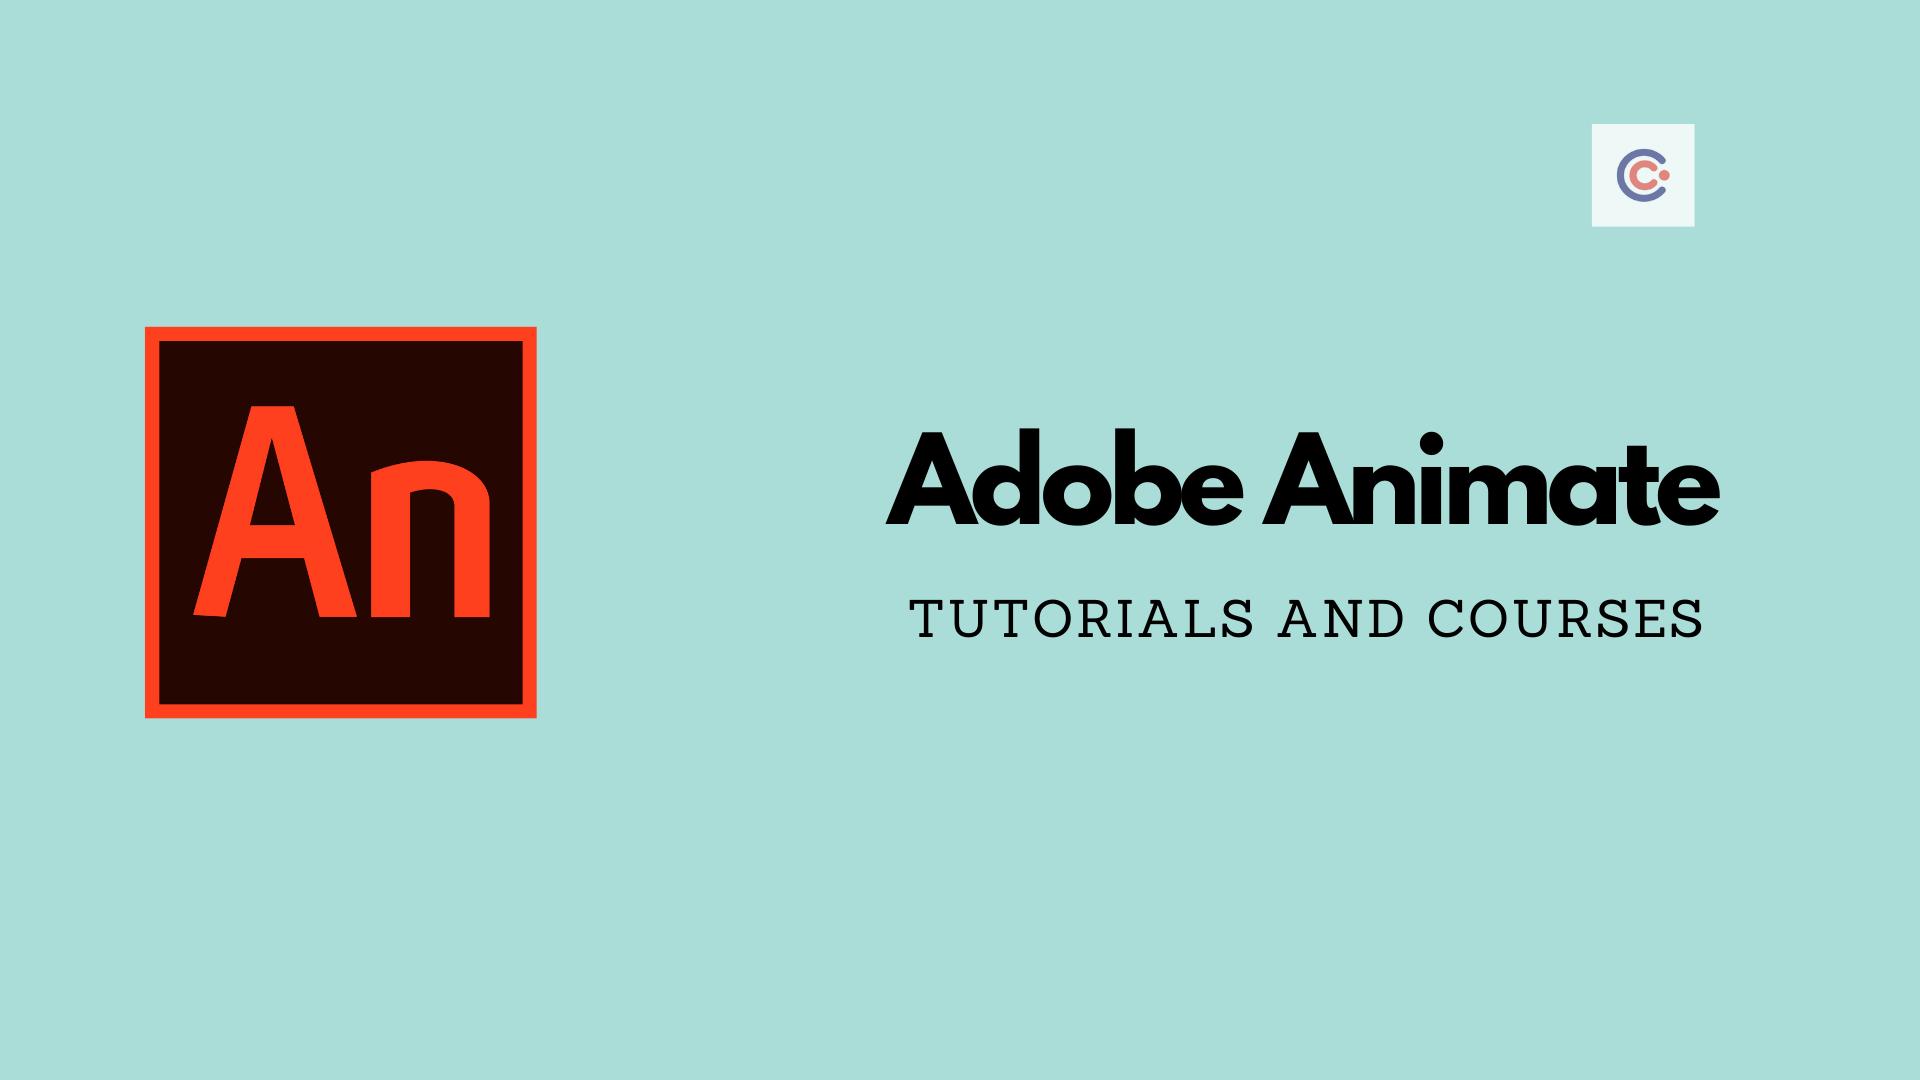 9 Best Adobe Animate Tutorials & Courses - Learn Adobe Animate Online